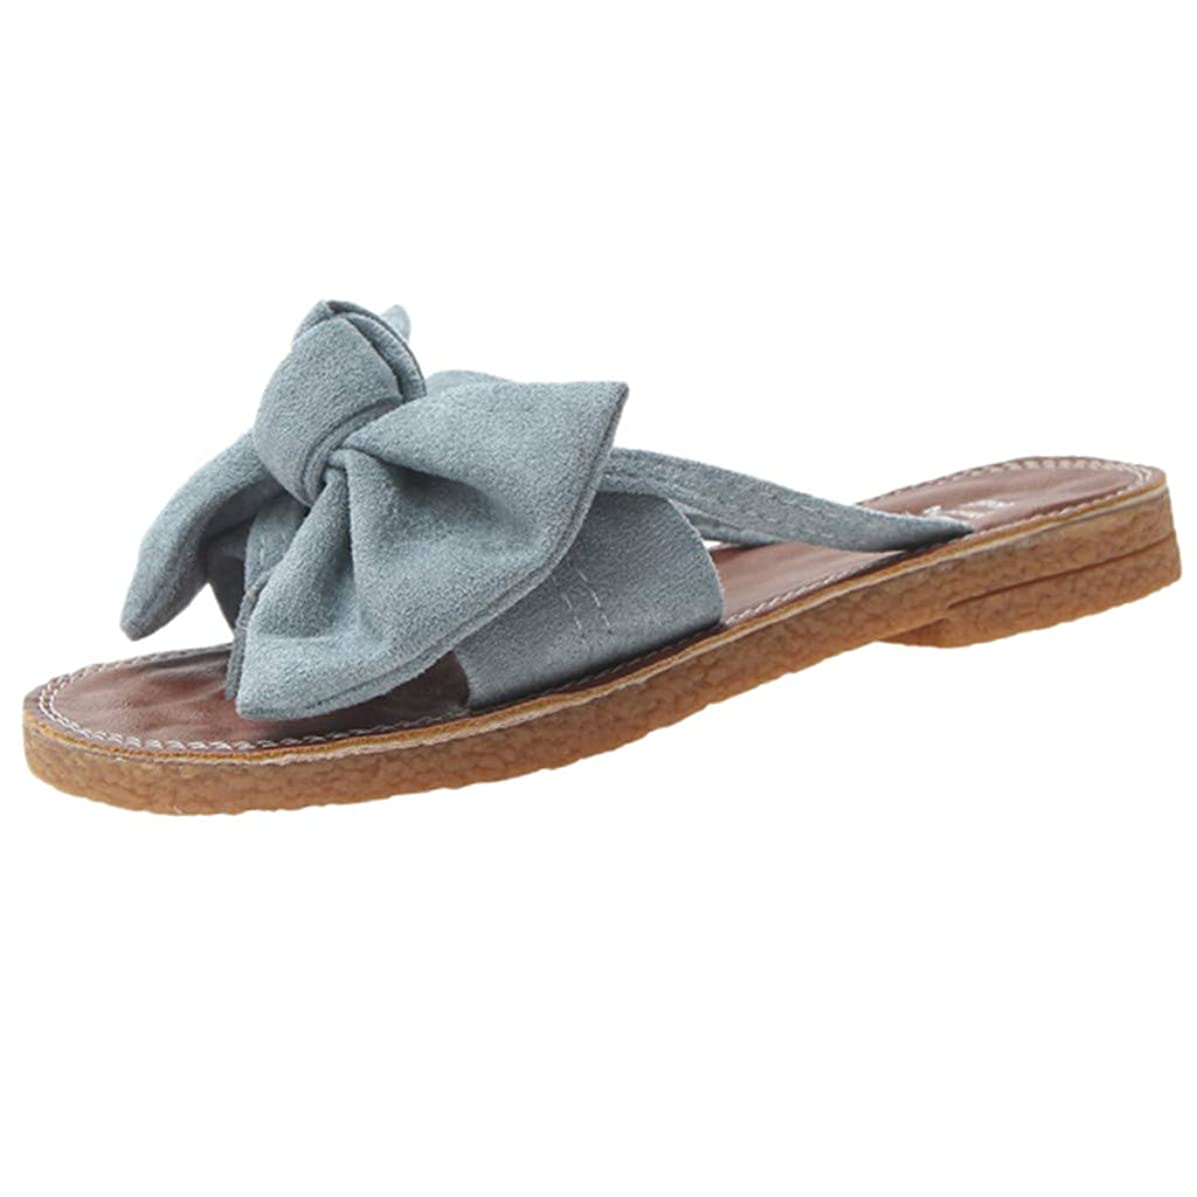 DENER Women Girls Ladies Summer Flat Slippers,Bow Tie Low Heels Wide Width Sandals Beach Shoes